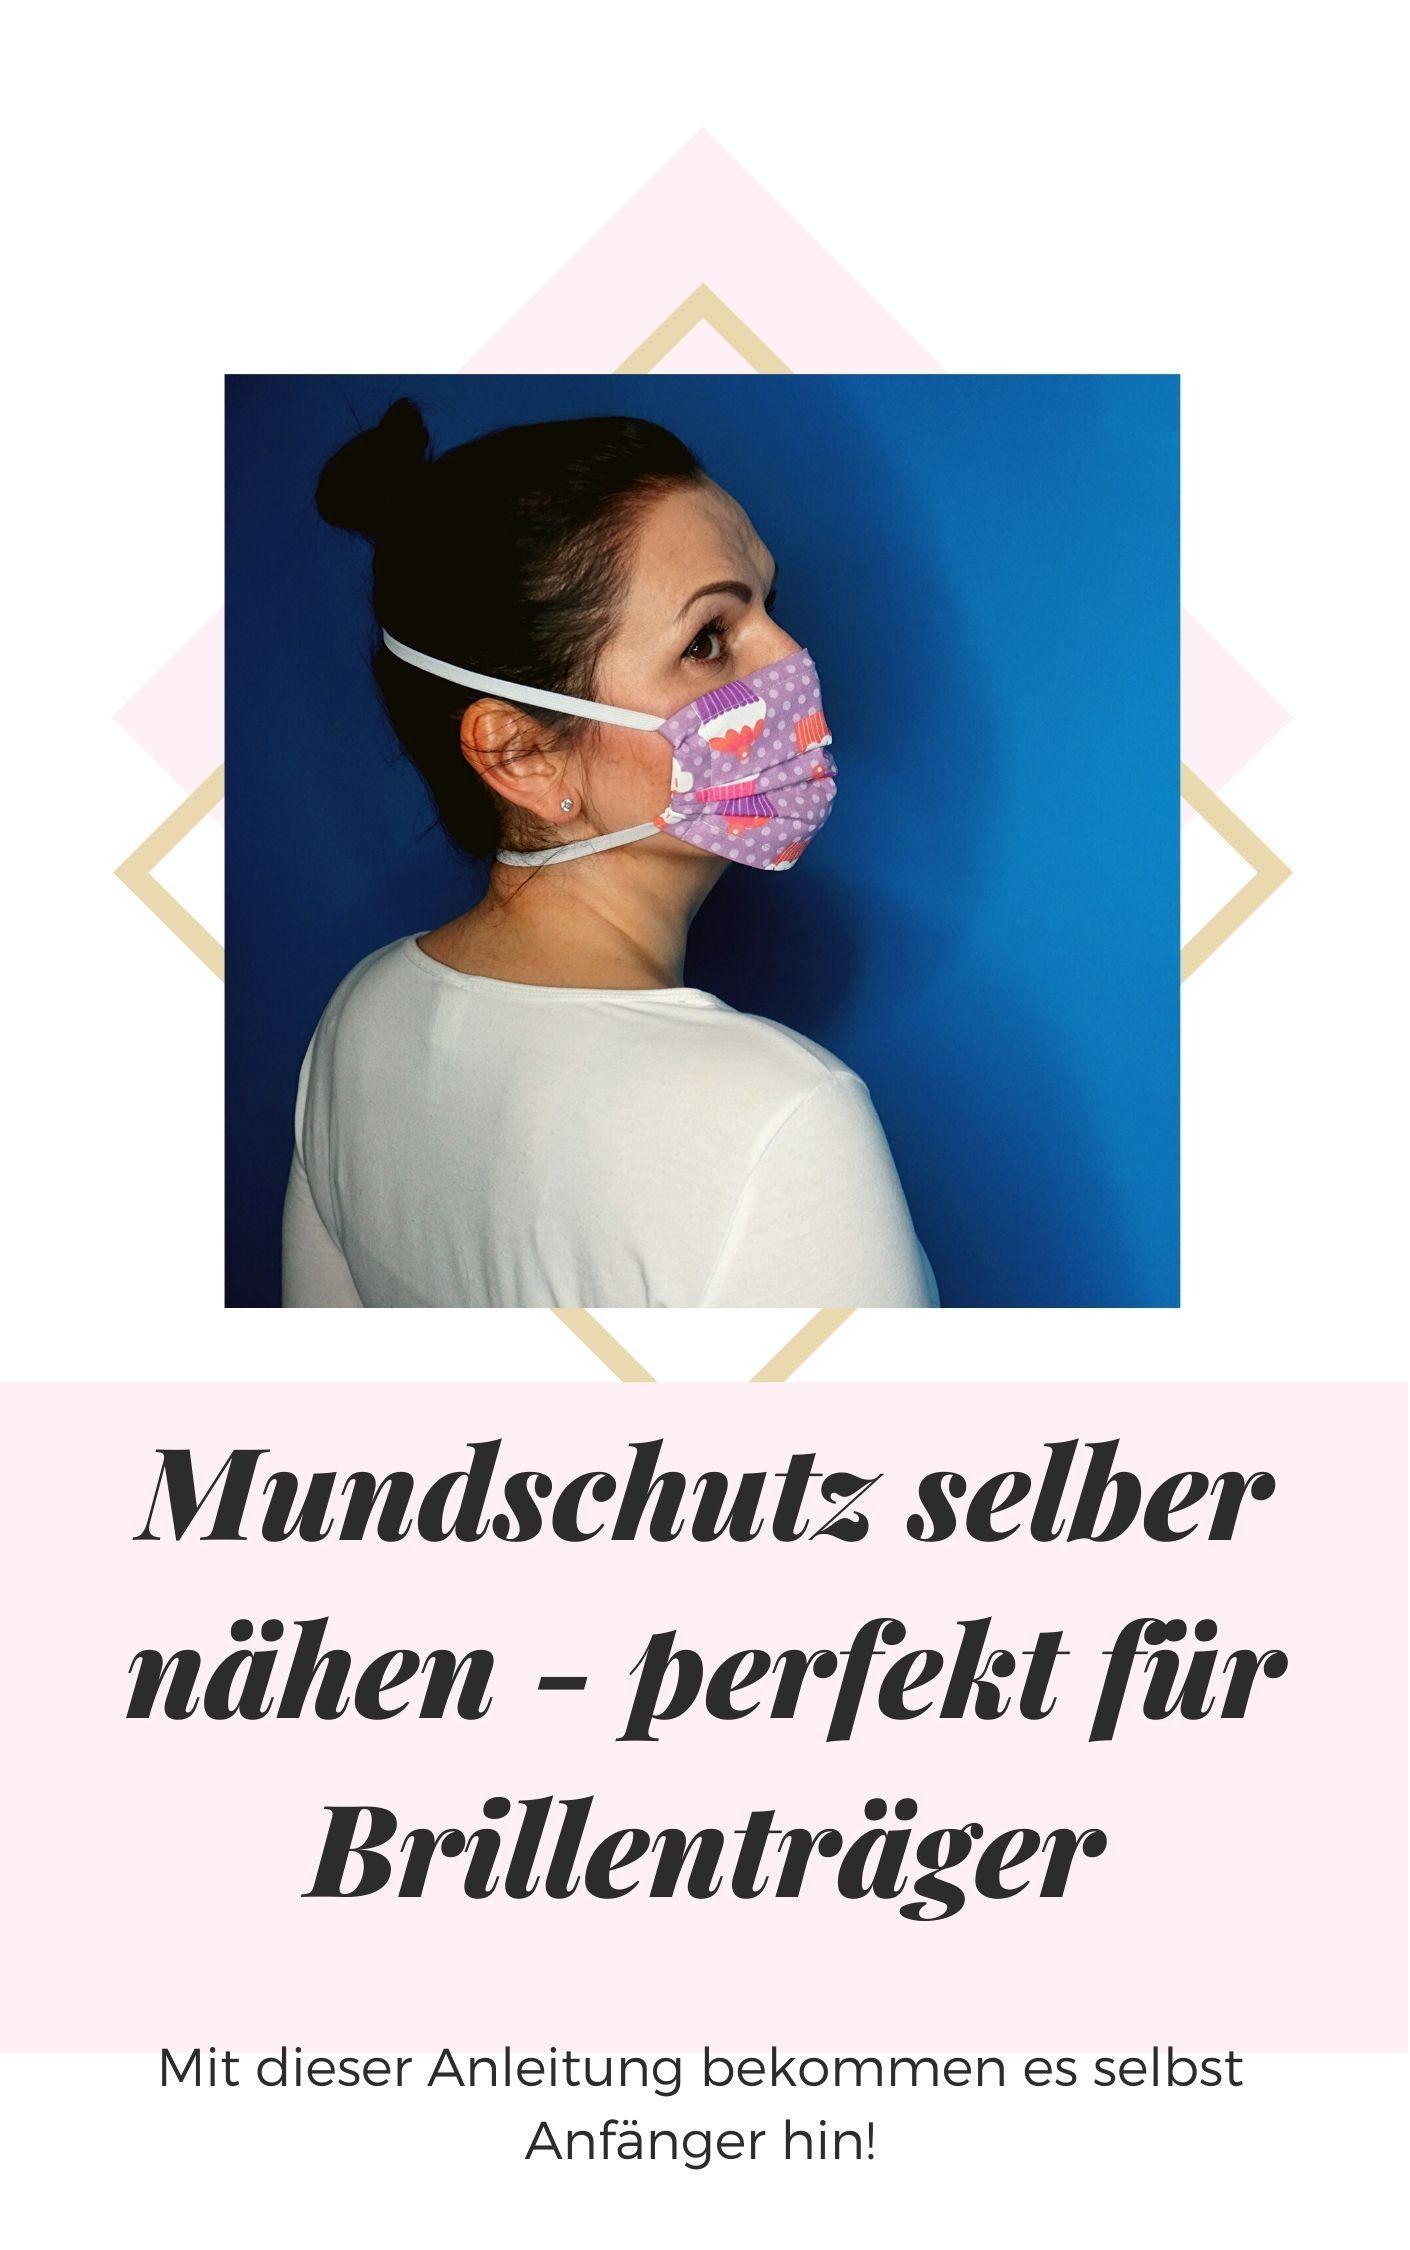 About You Mundschutz